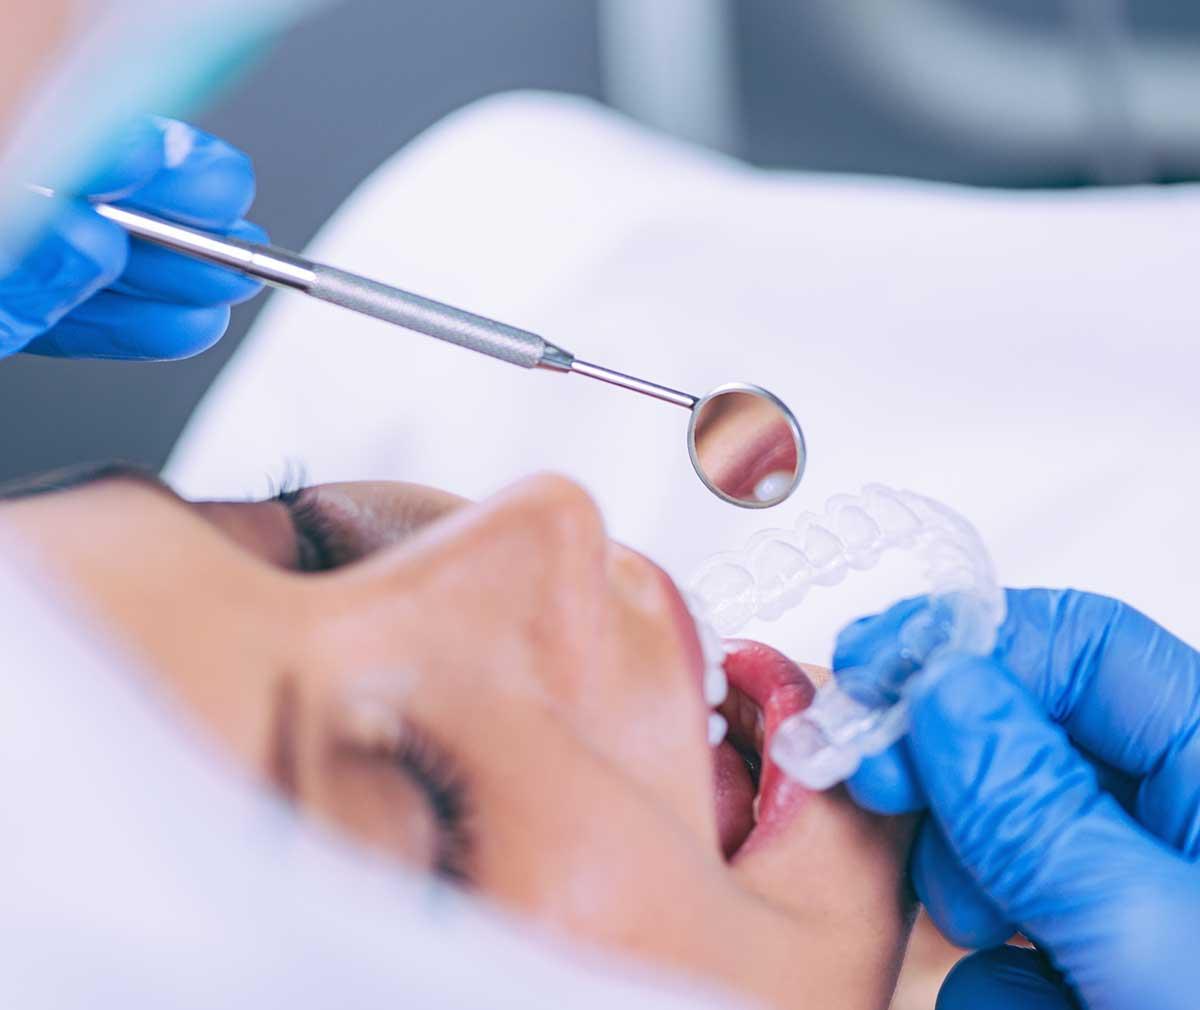 Retenedor de ortodoncia - Clínica dental Ramís Tauler